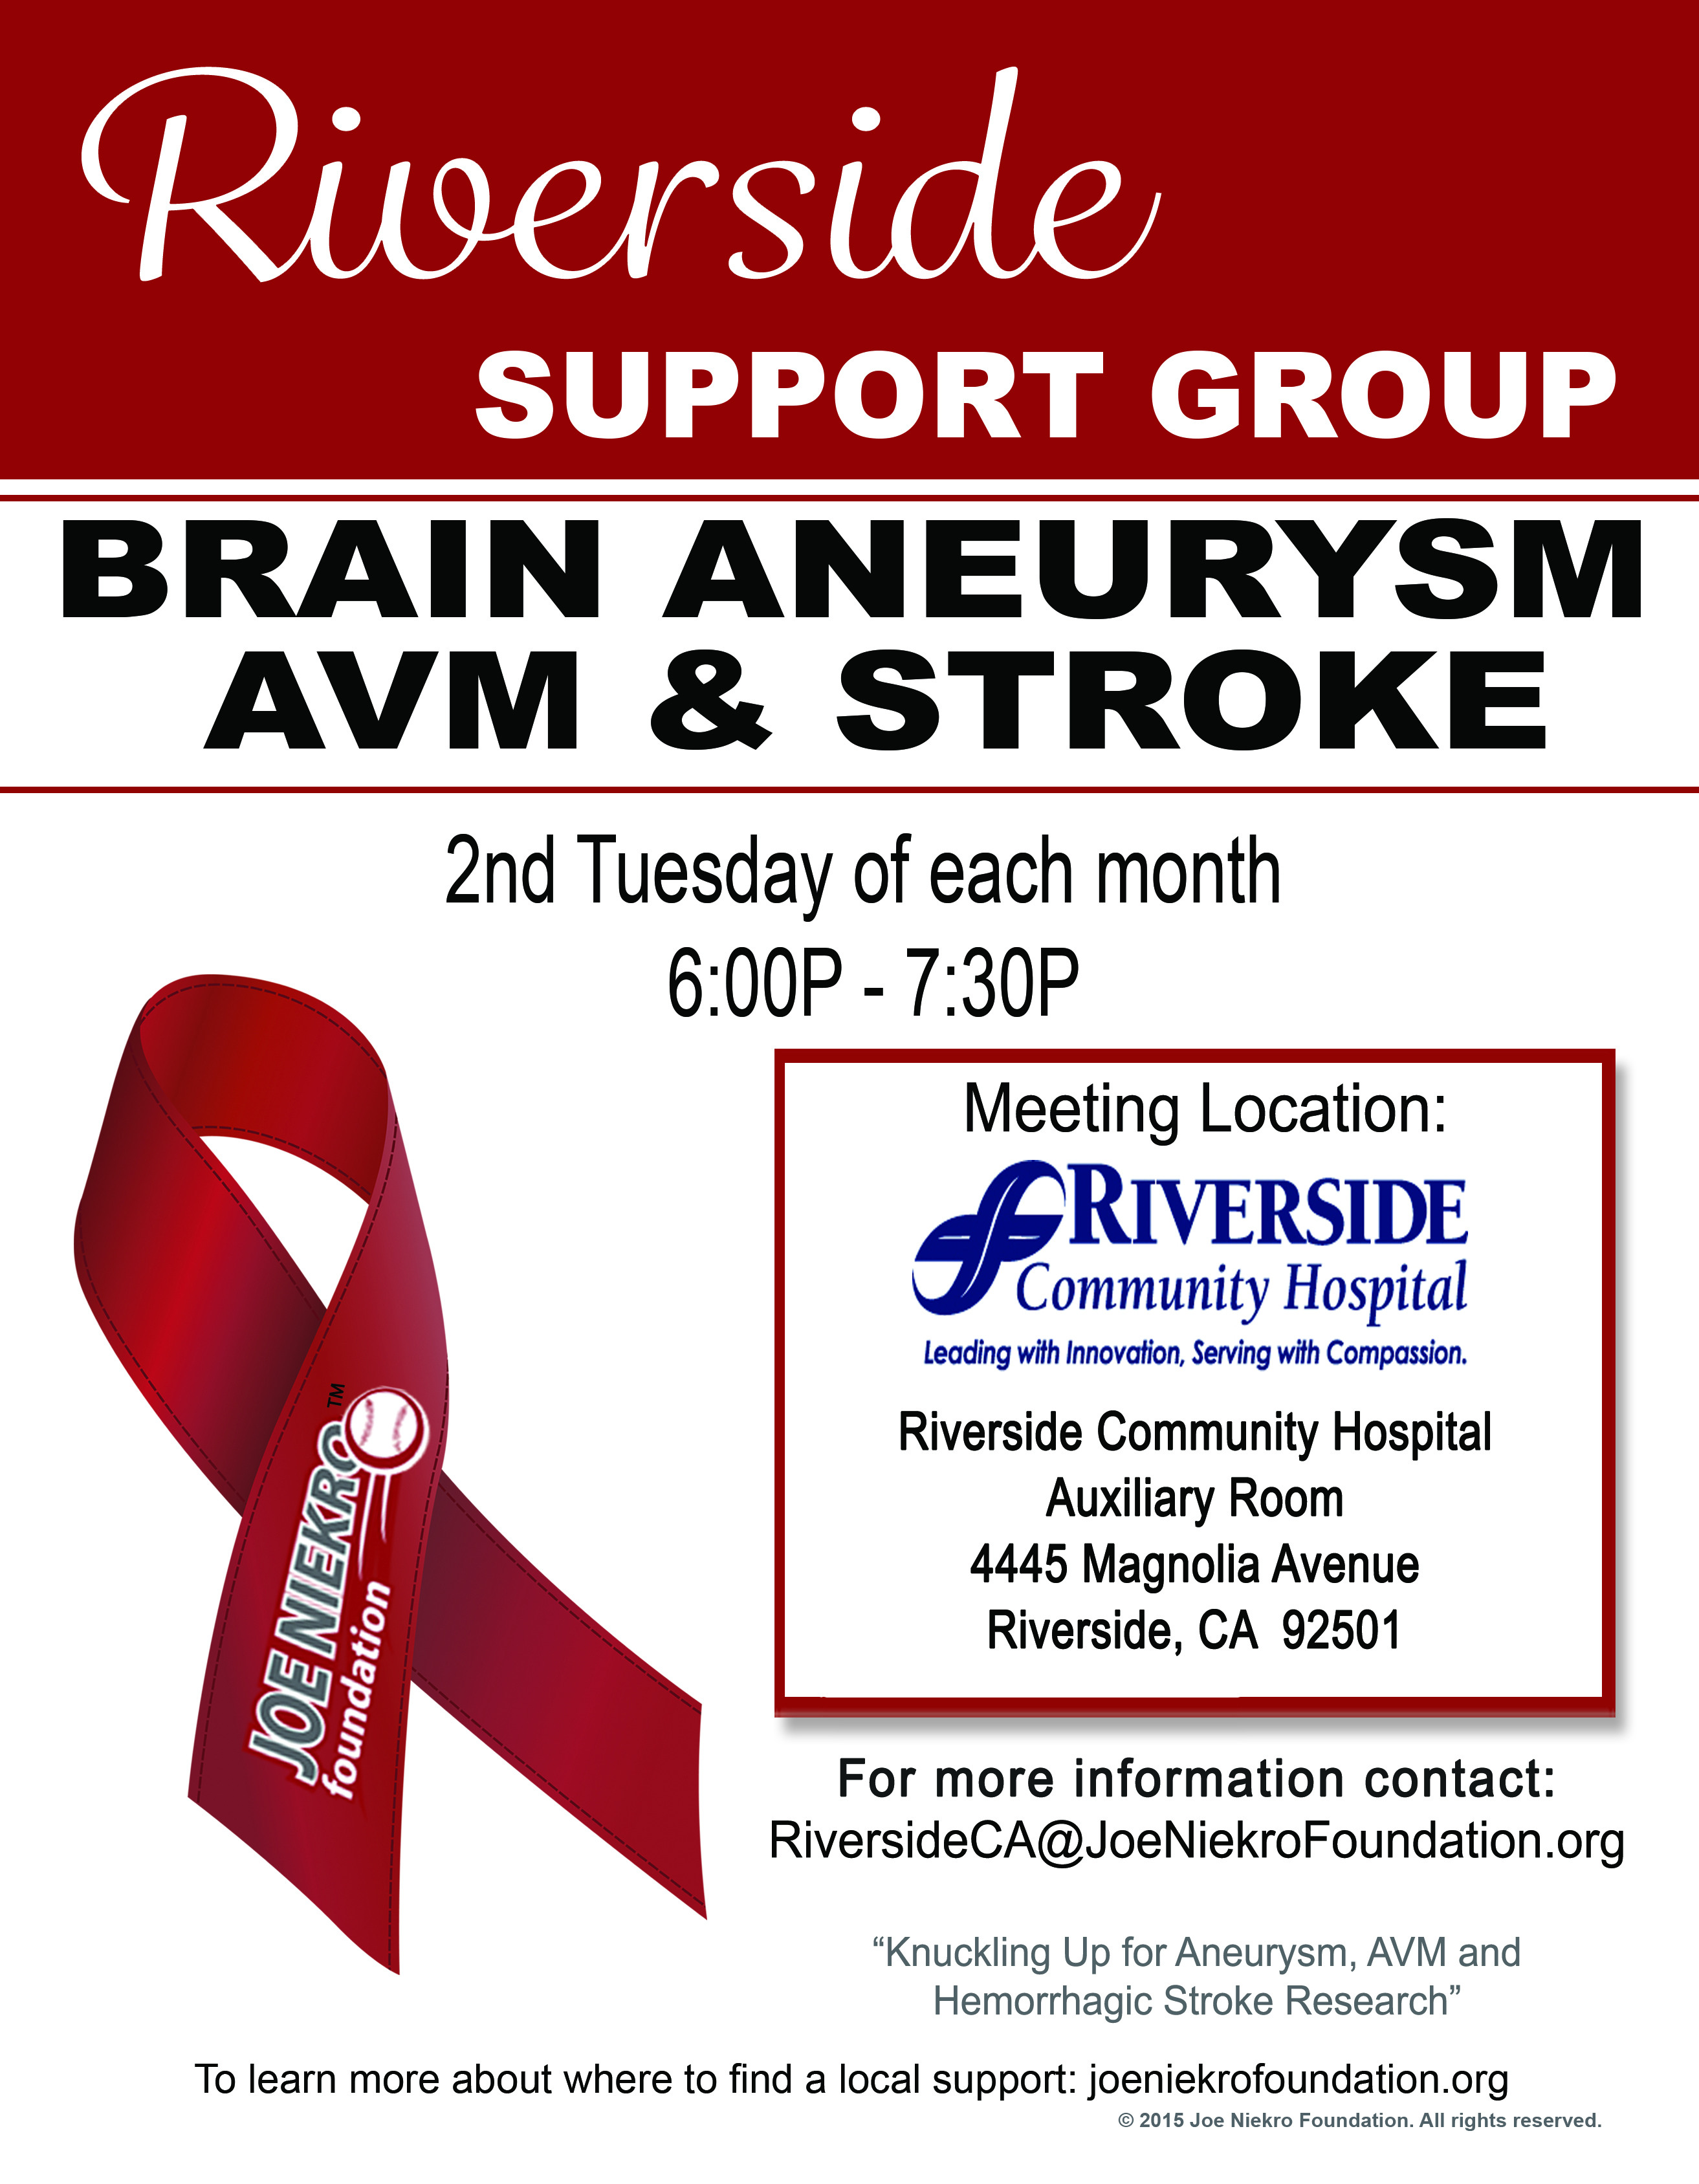 http://www.joeniekrofoundation.com/patient-caregiver-support/support-groups/locations/attachment/riverside-poster-2/